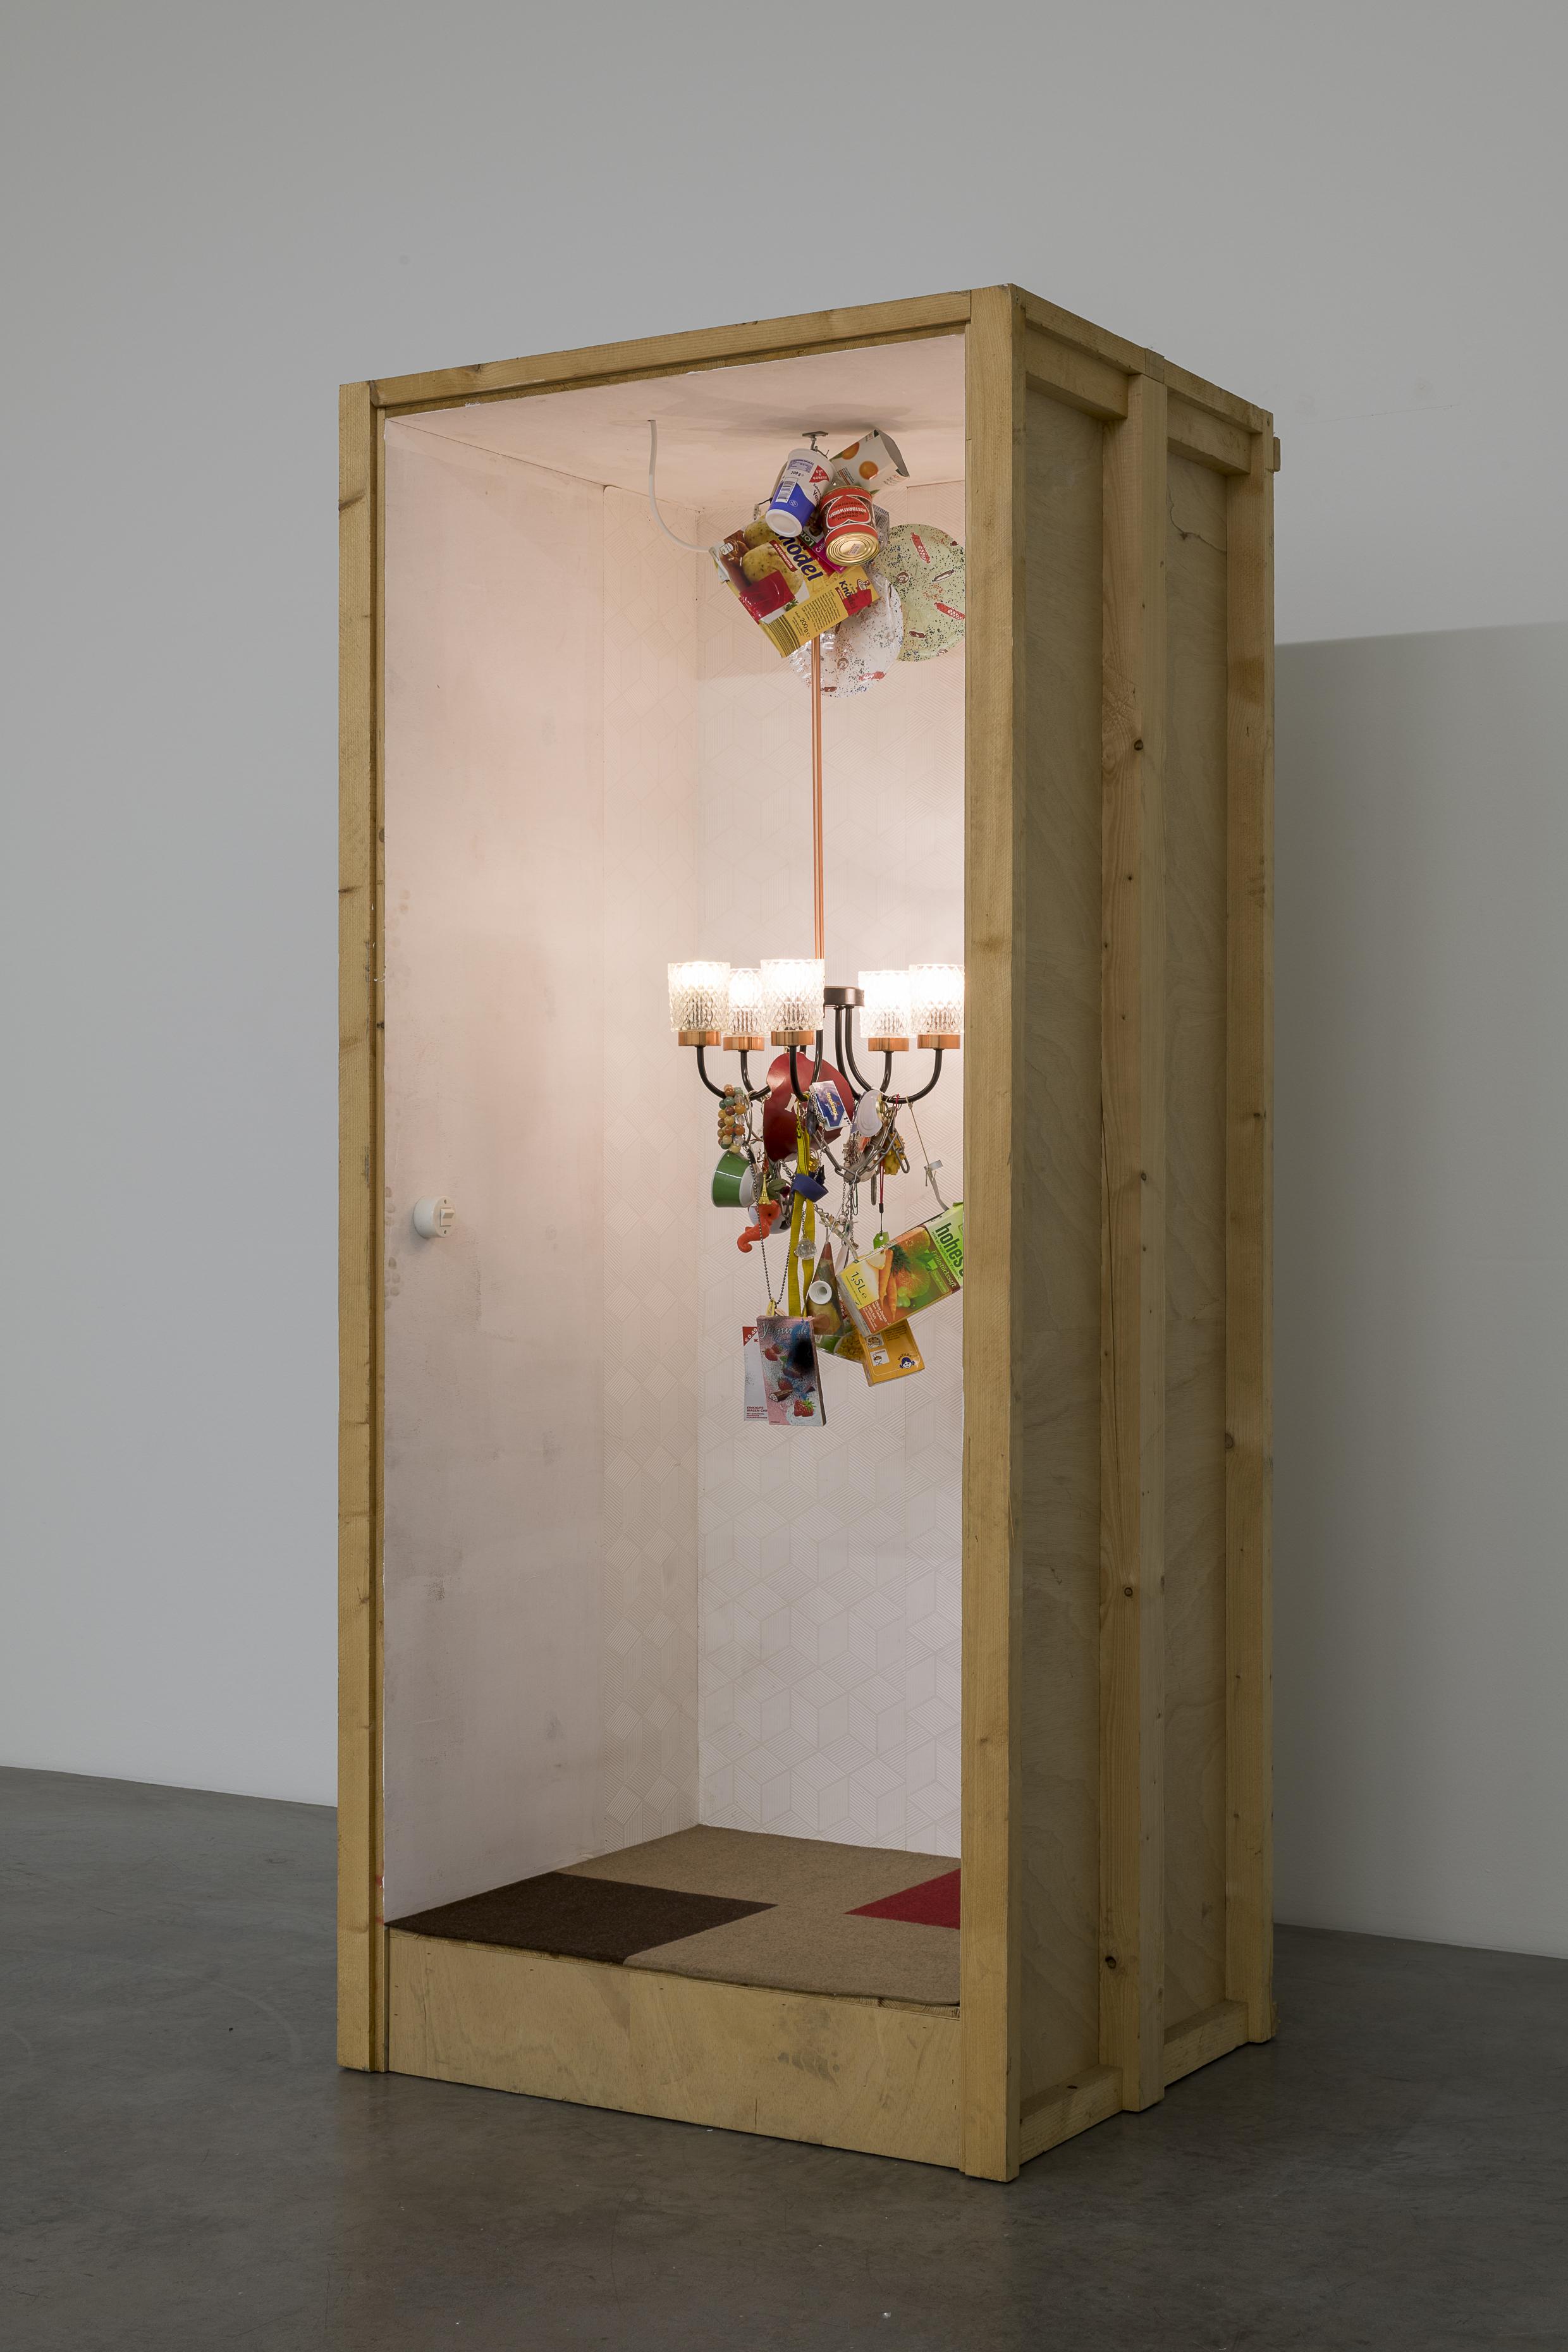 Courtesy the artist and Galerie Neu, Berlin Photography: Stefan Korte